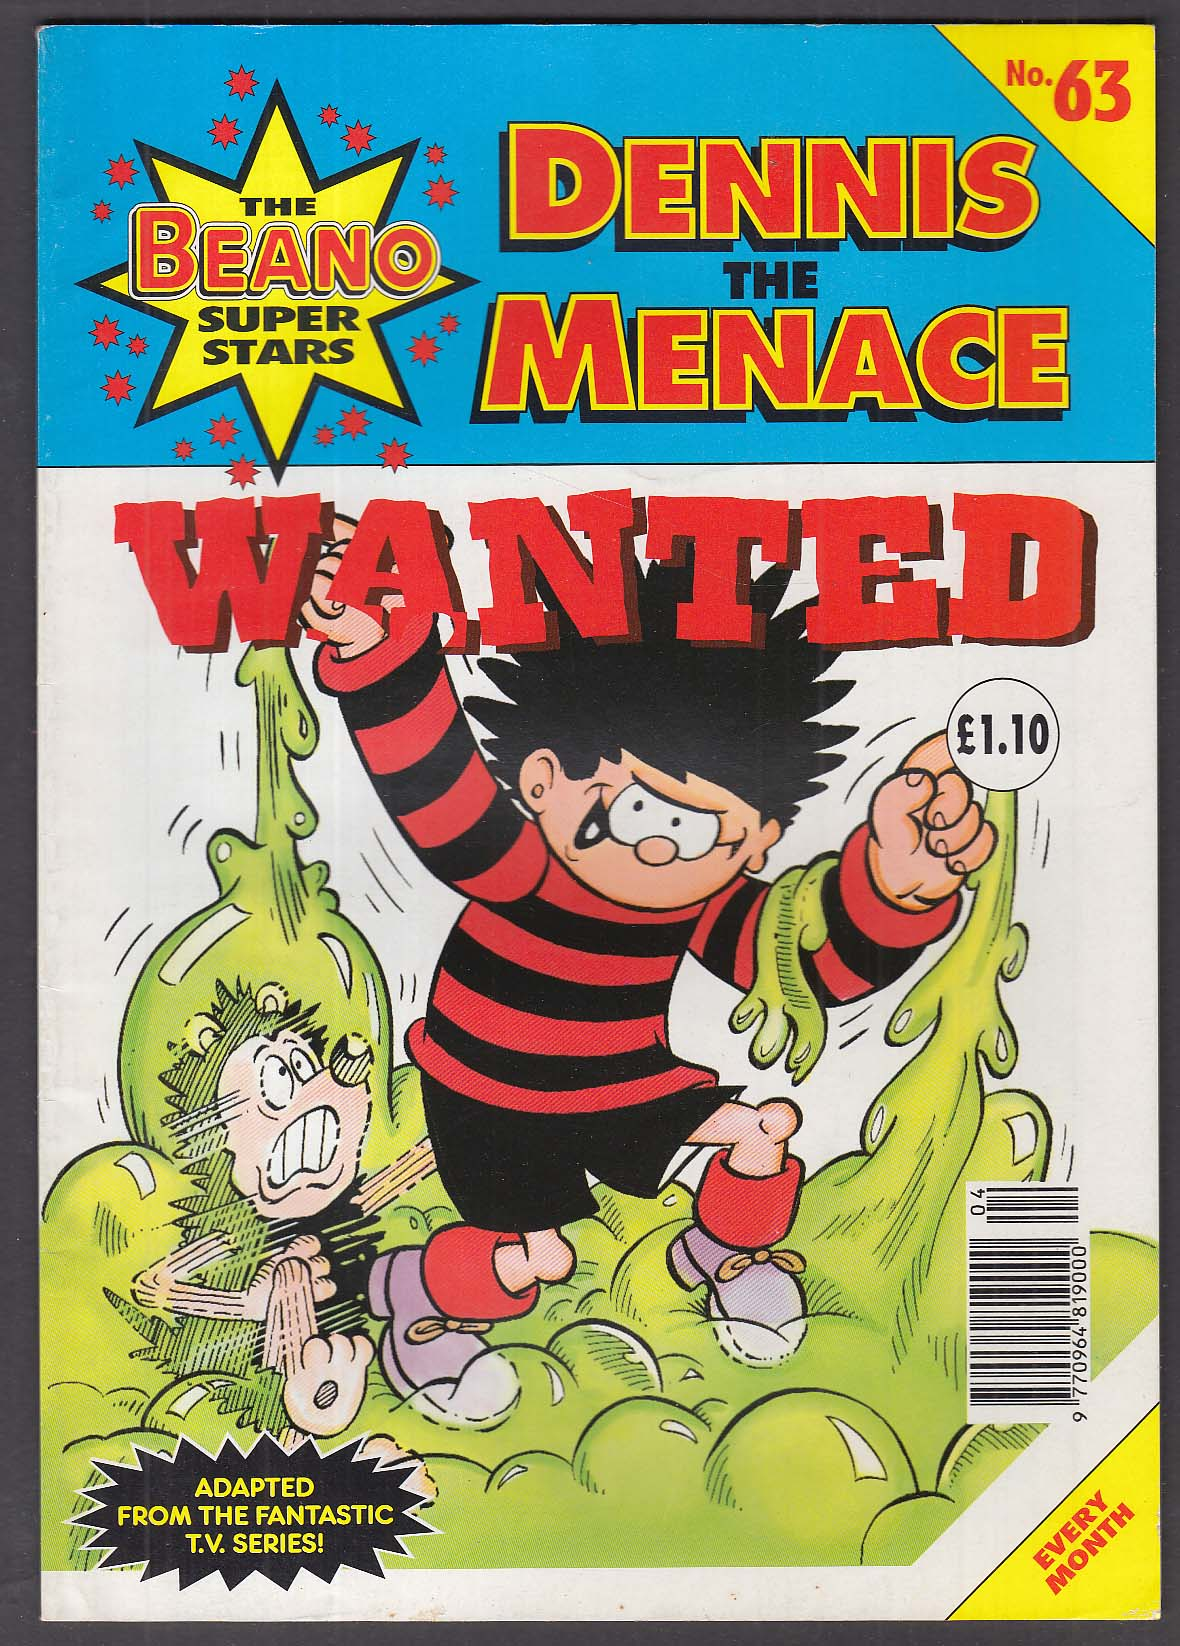 BEANO SUPERSTARS #63 Dennis the Menace UK comic book 1997